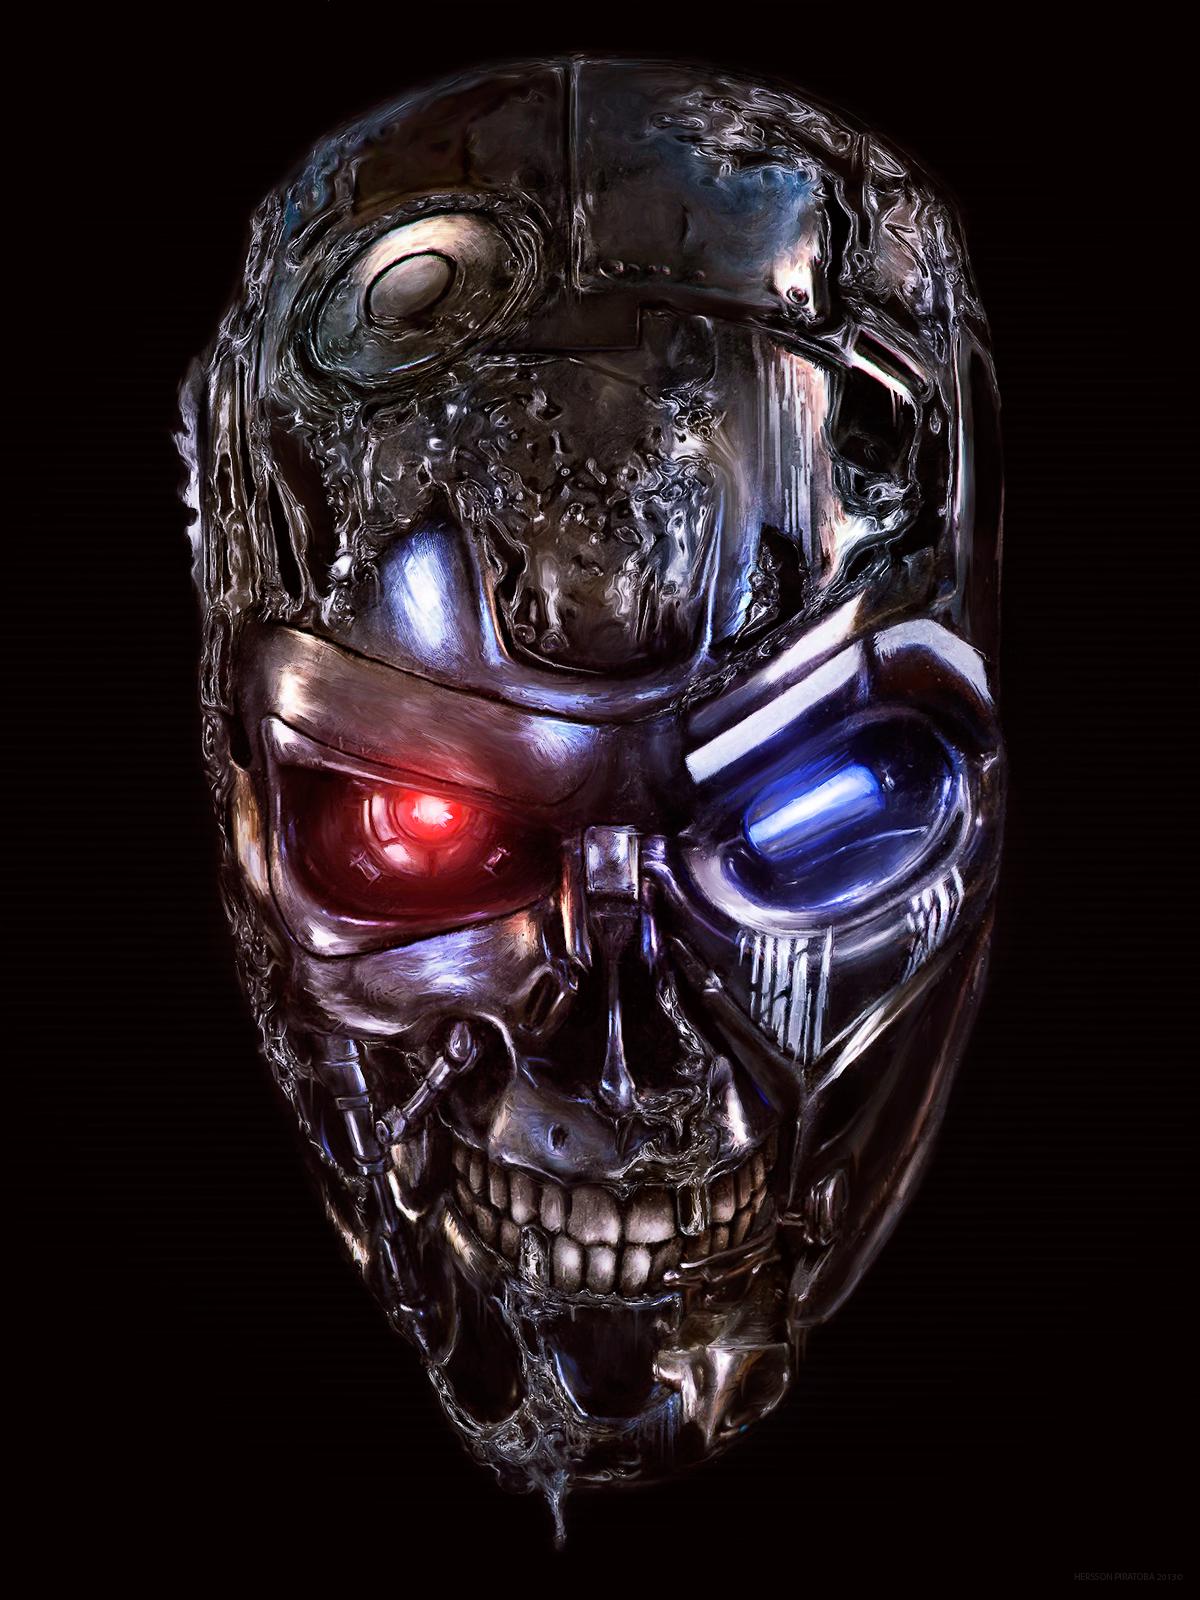 11125963283 a8f8a05655 o jpgRobot Face Drawing